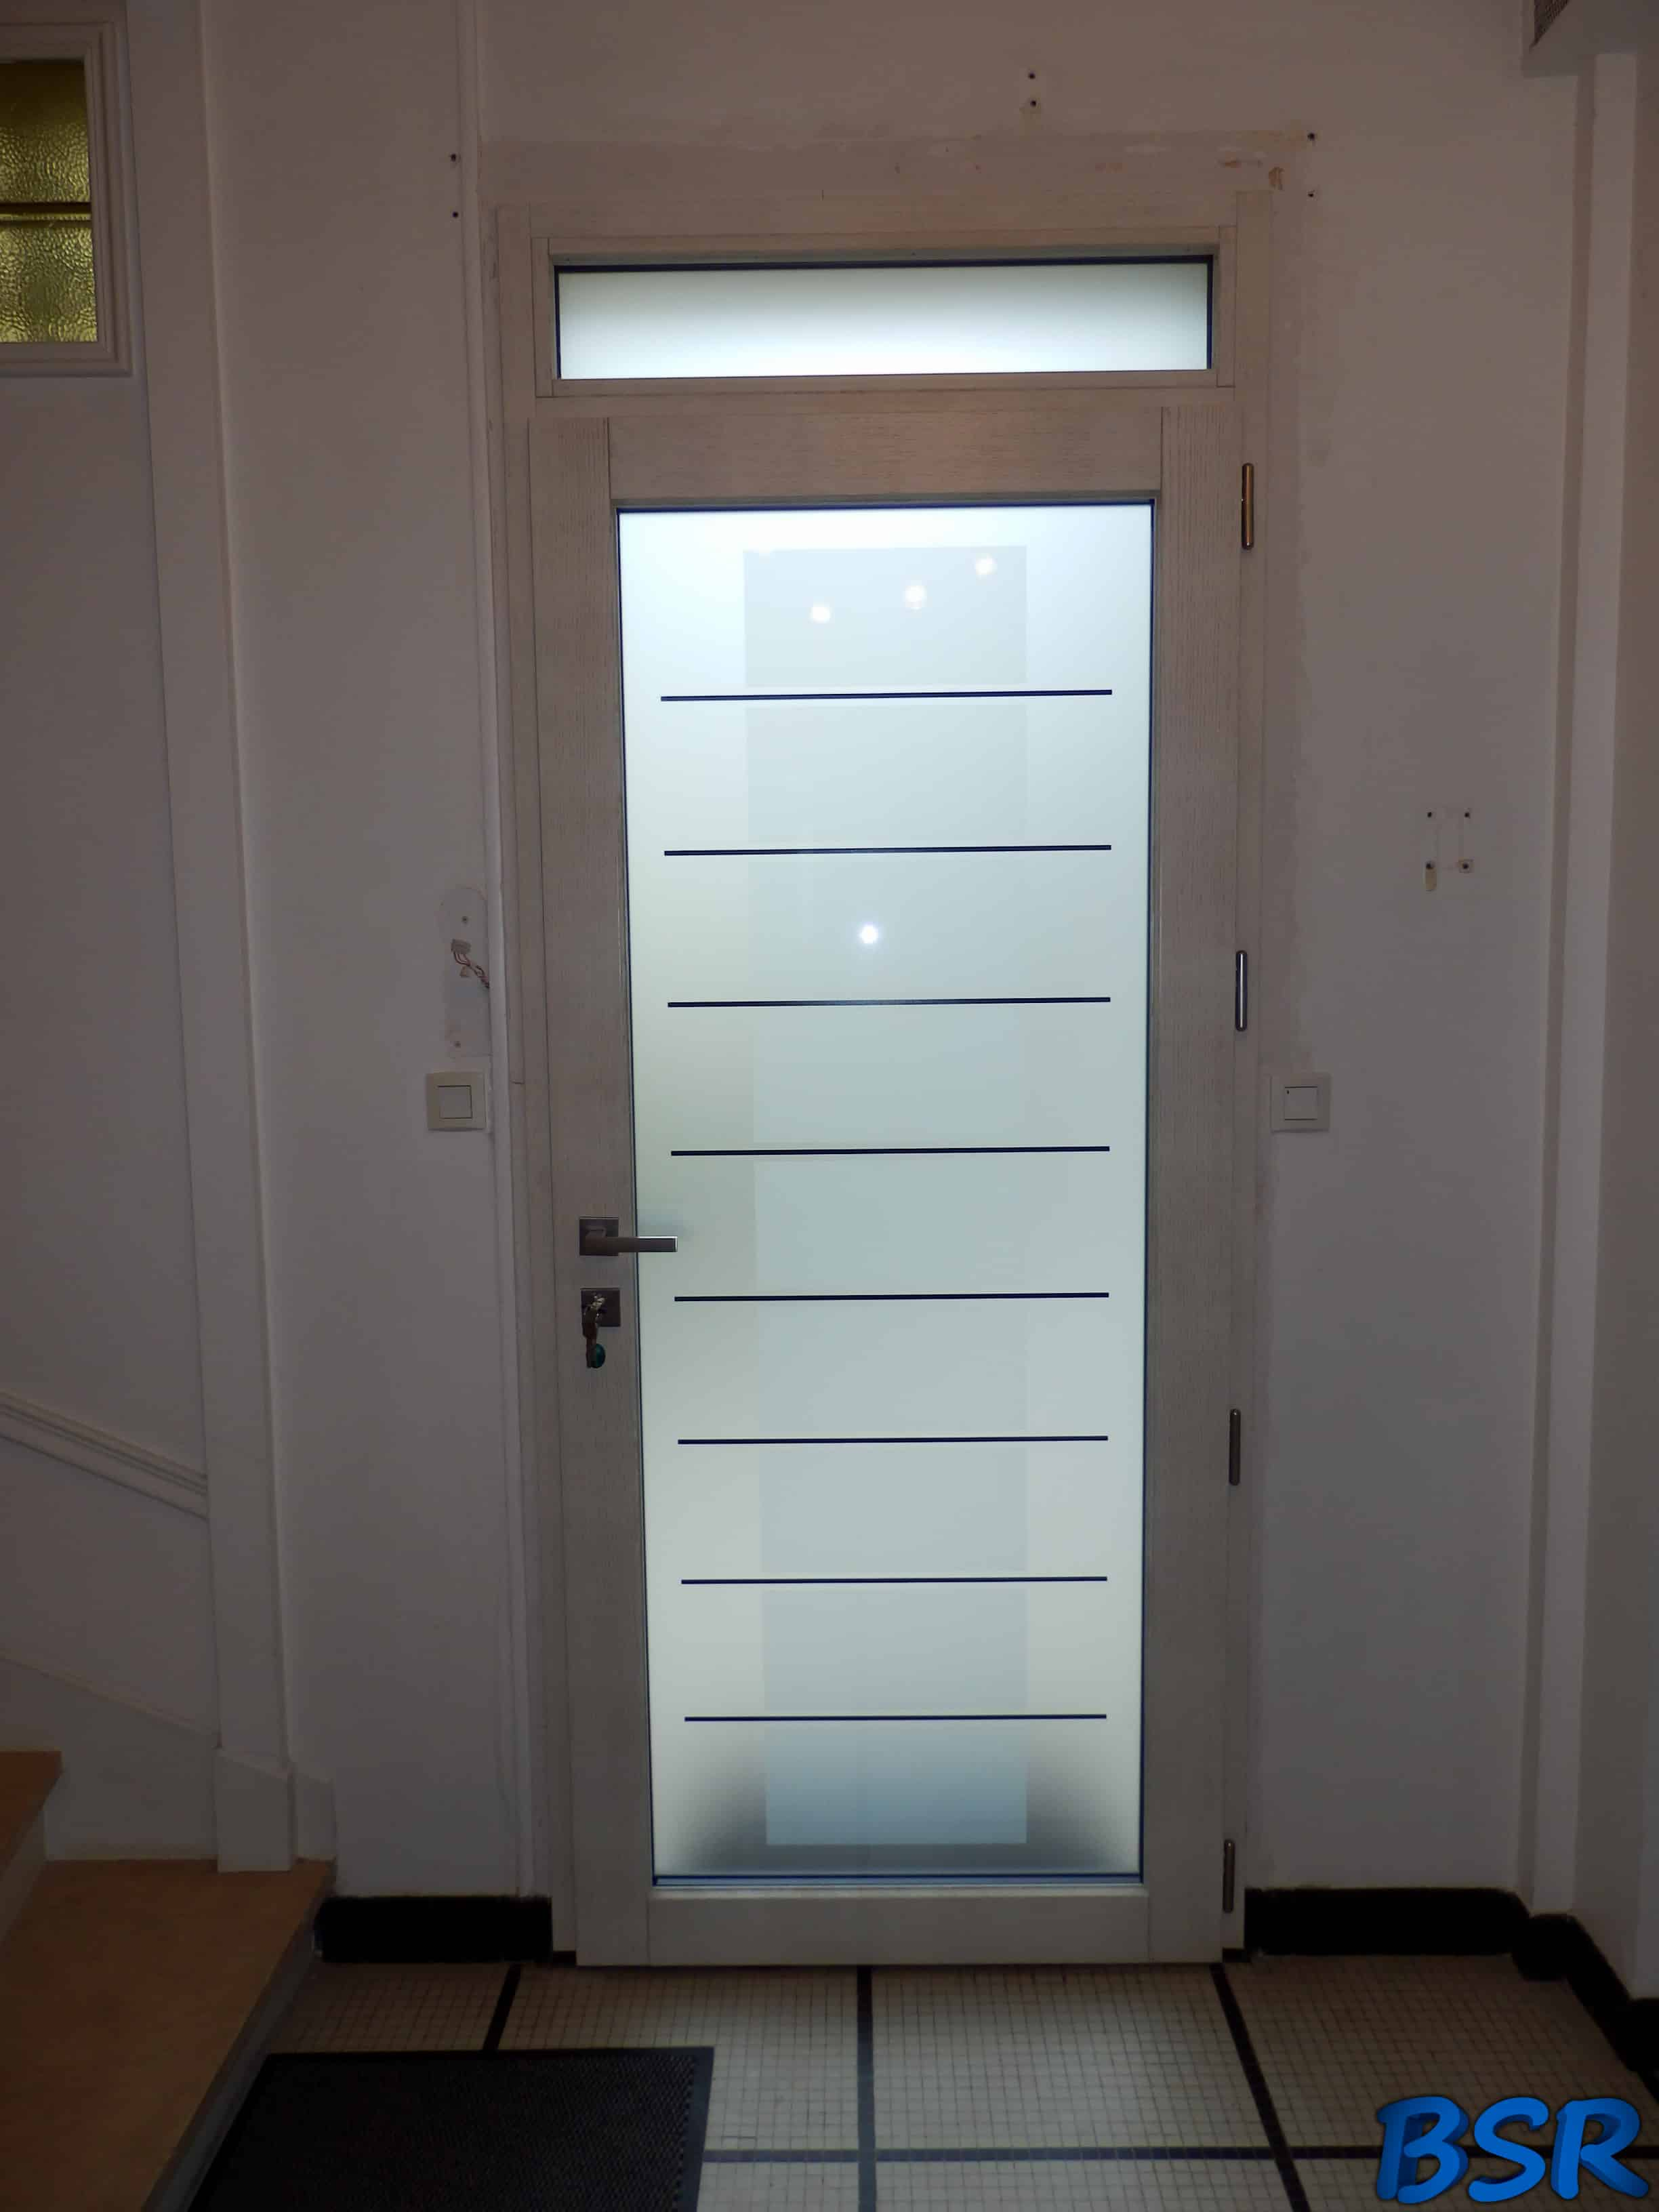 Porte et fenêtre Aluminium BSR 003